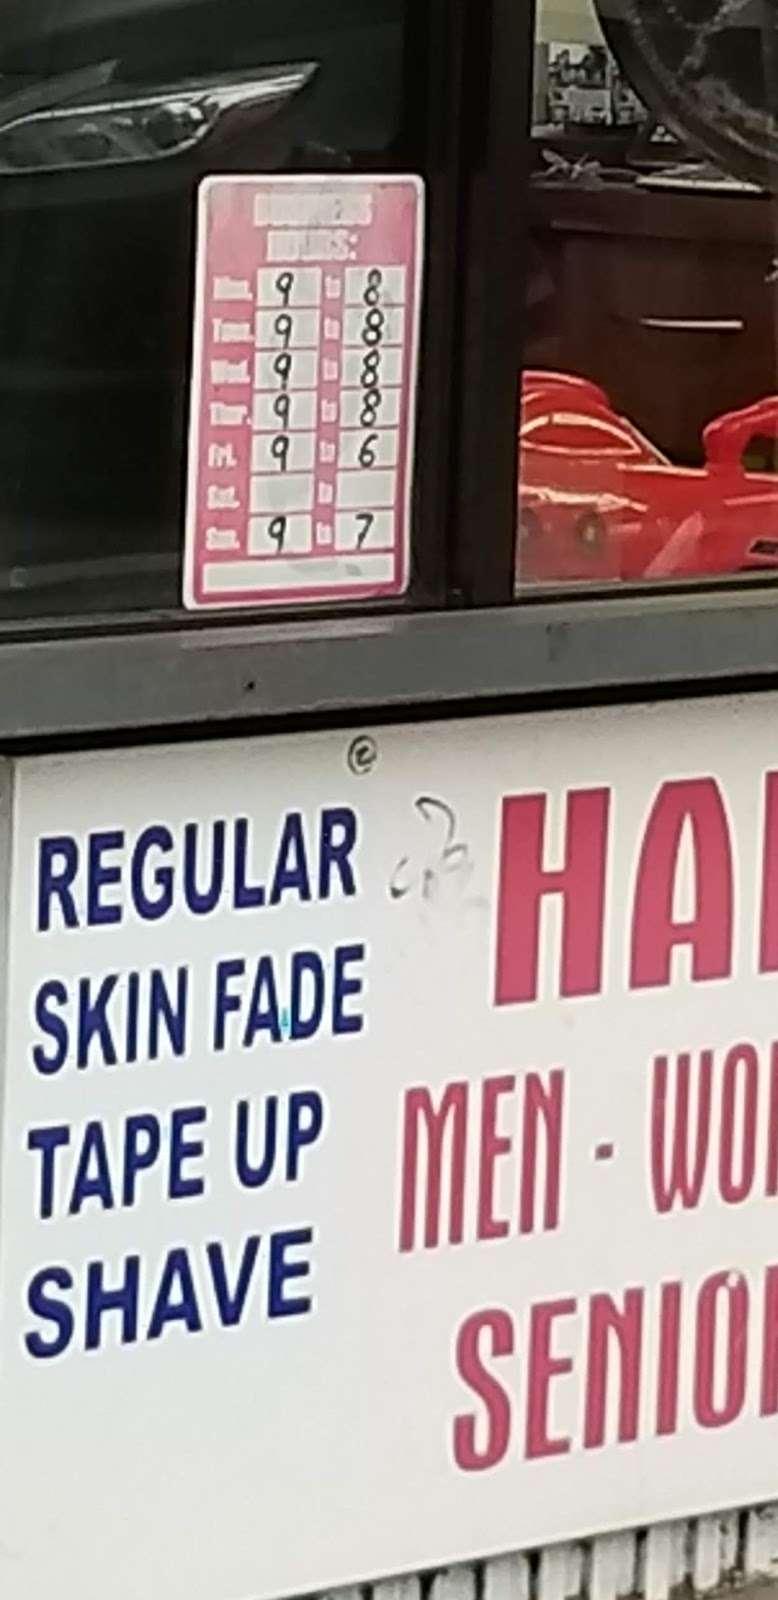 Marks Barber Shop & Beauty Salon - hair care  | Photo 5 of 6 | Address: 68-68 Fresh Pond Rd, Ridgewood, NY 11385, USA